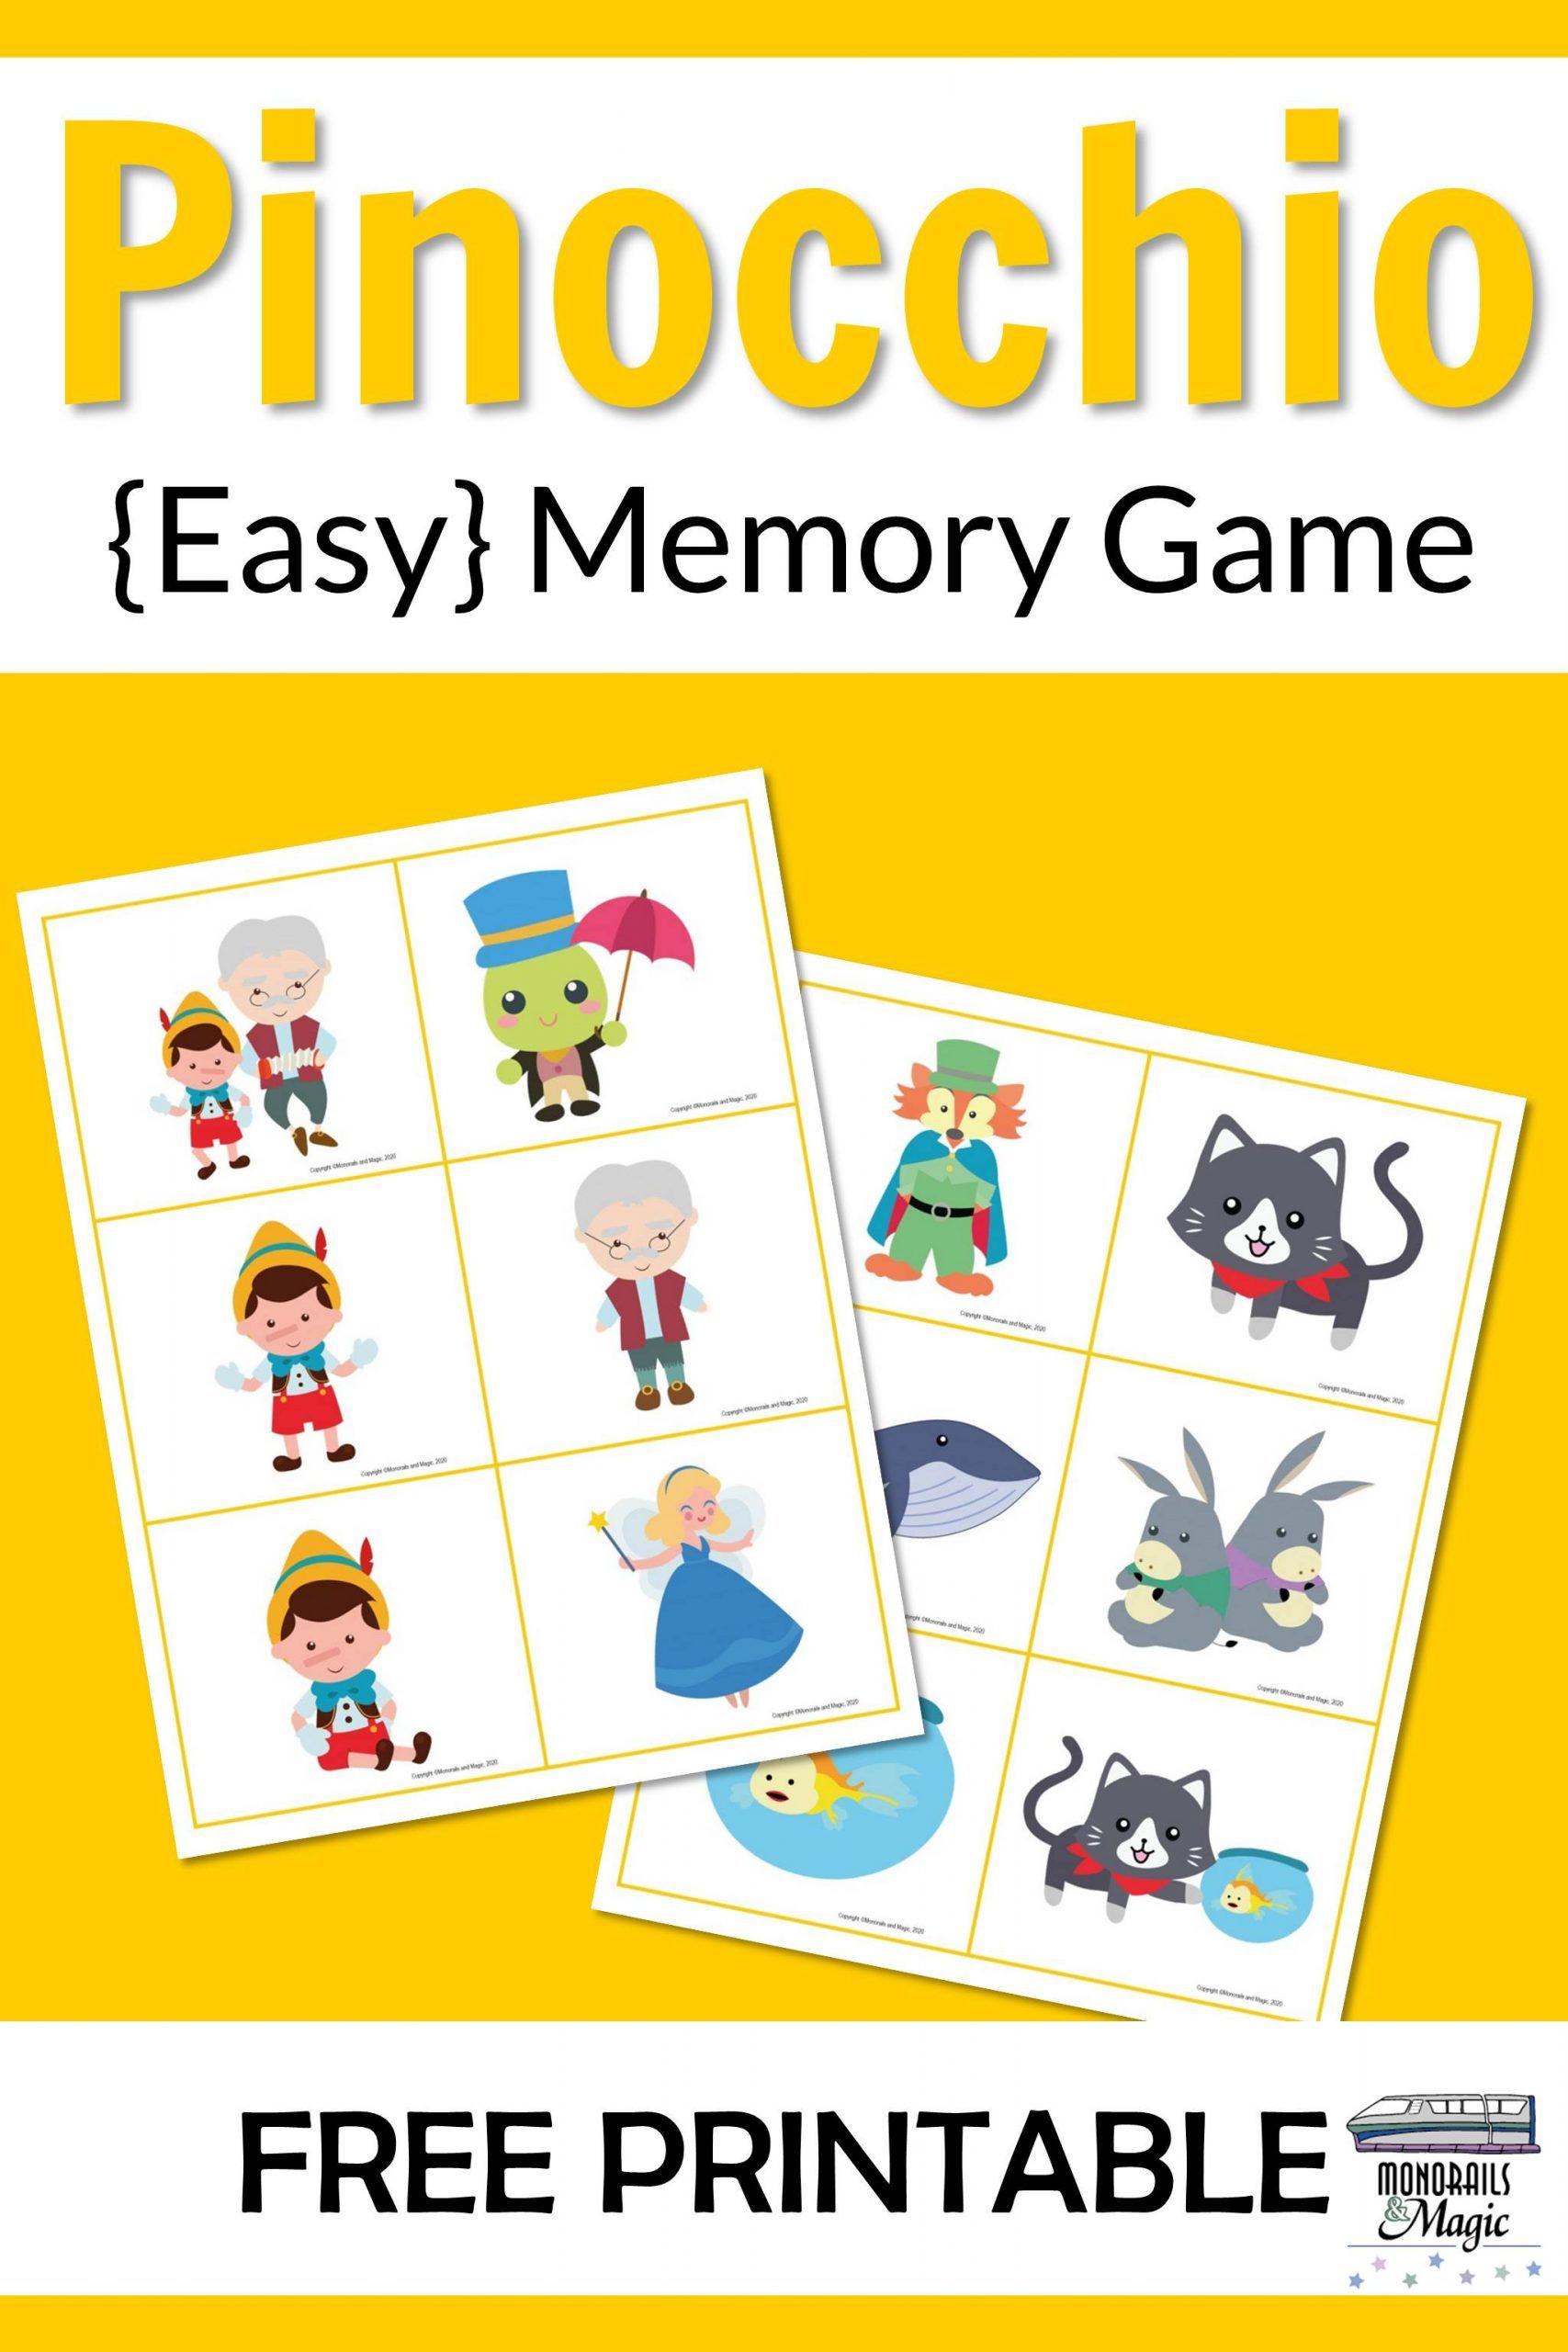 Pinocchio Memory Game Free Printable in 2020 Memory